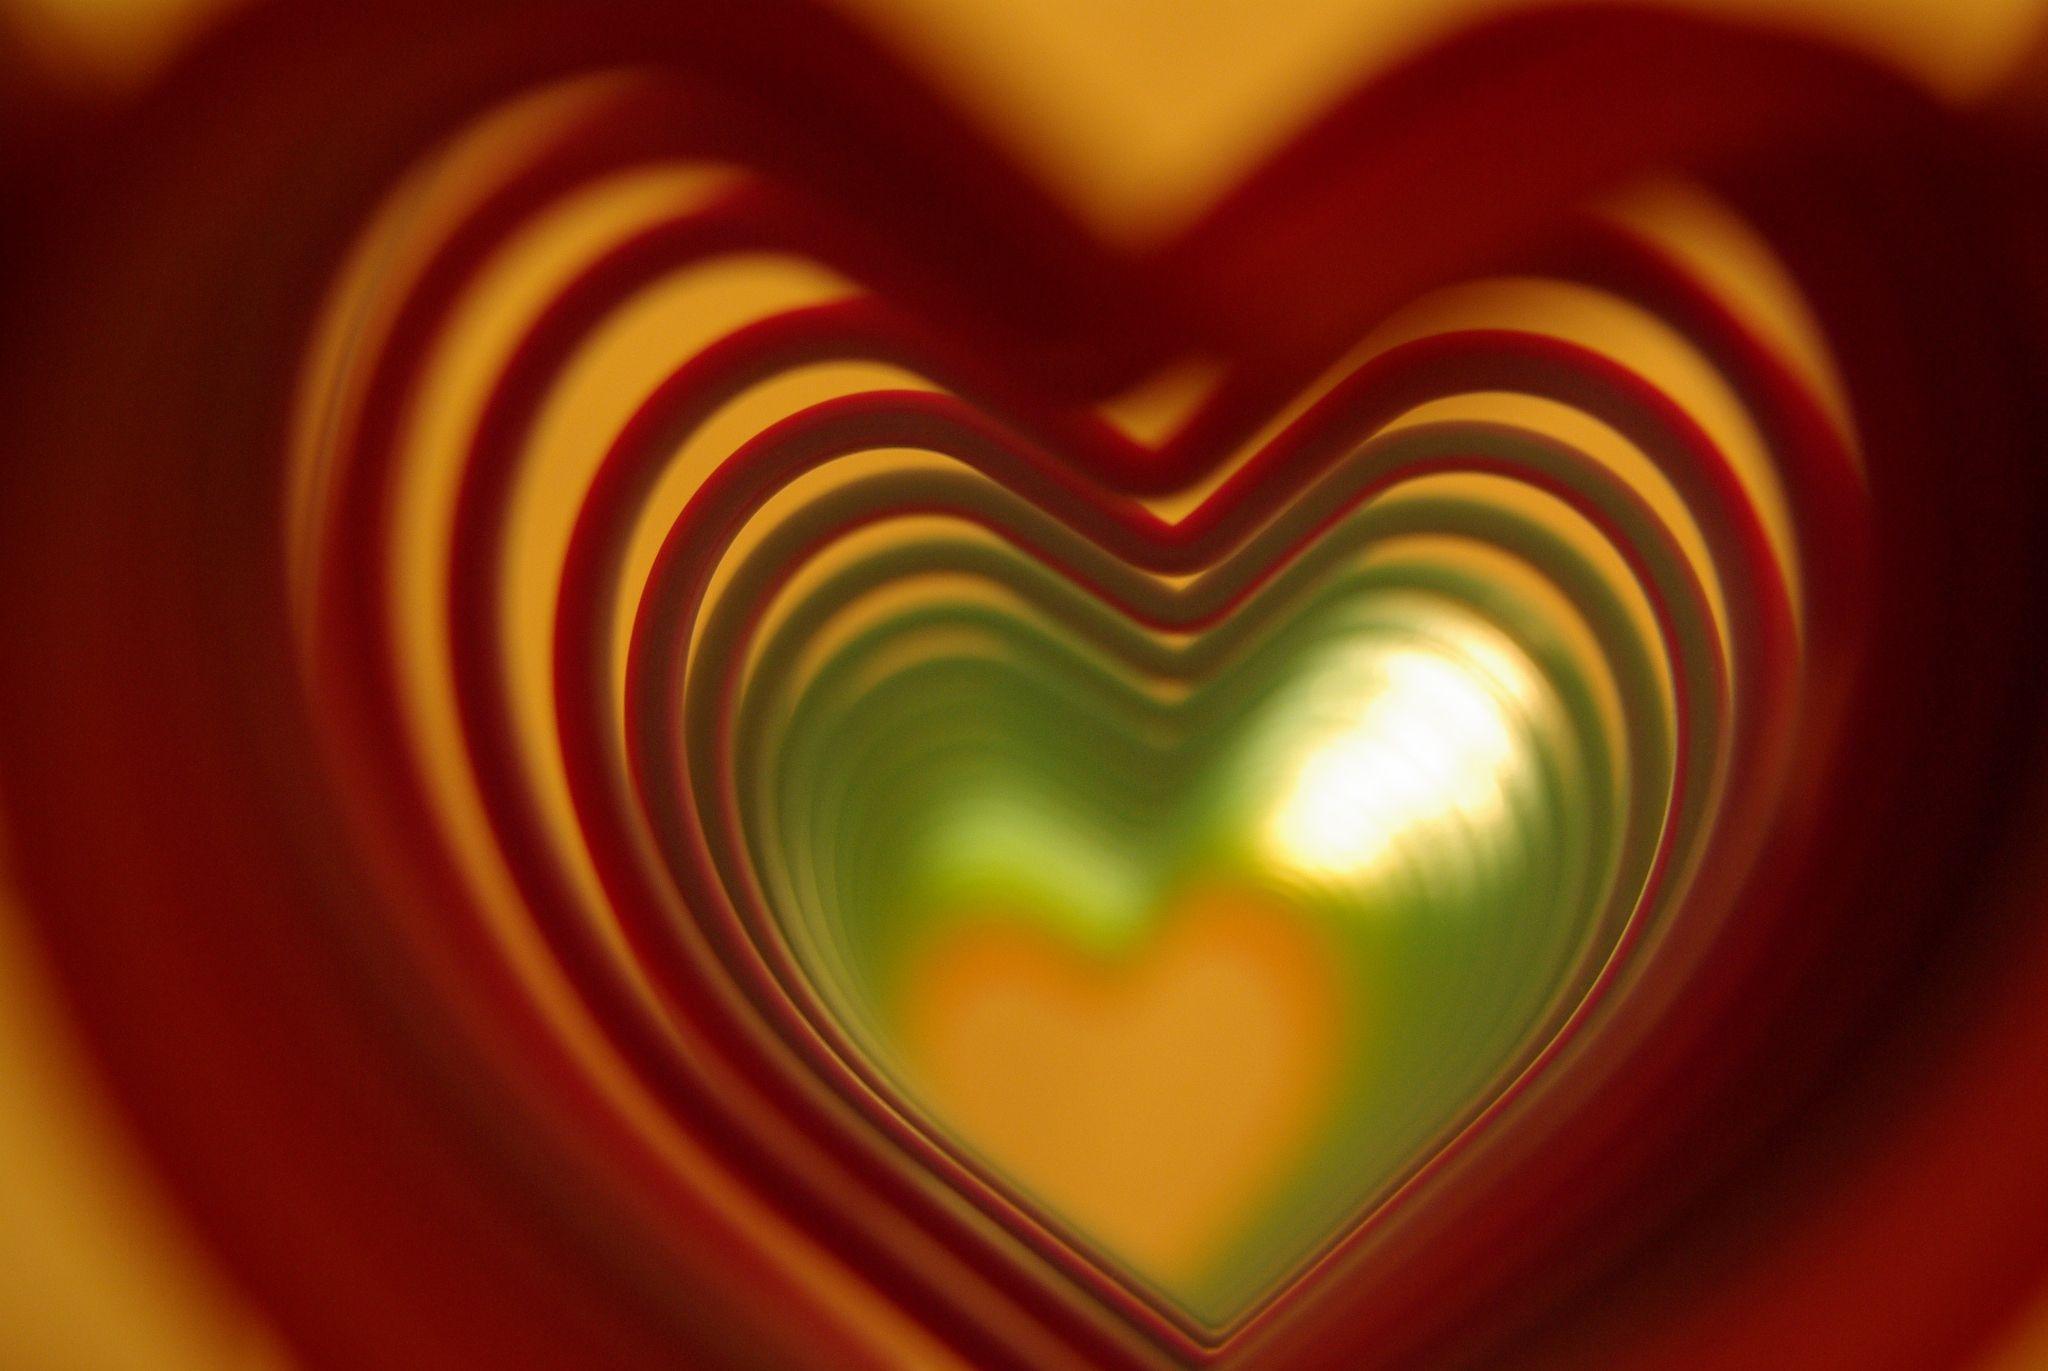 Happy Valentine's Day by David McMahon on 500px